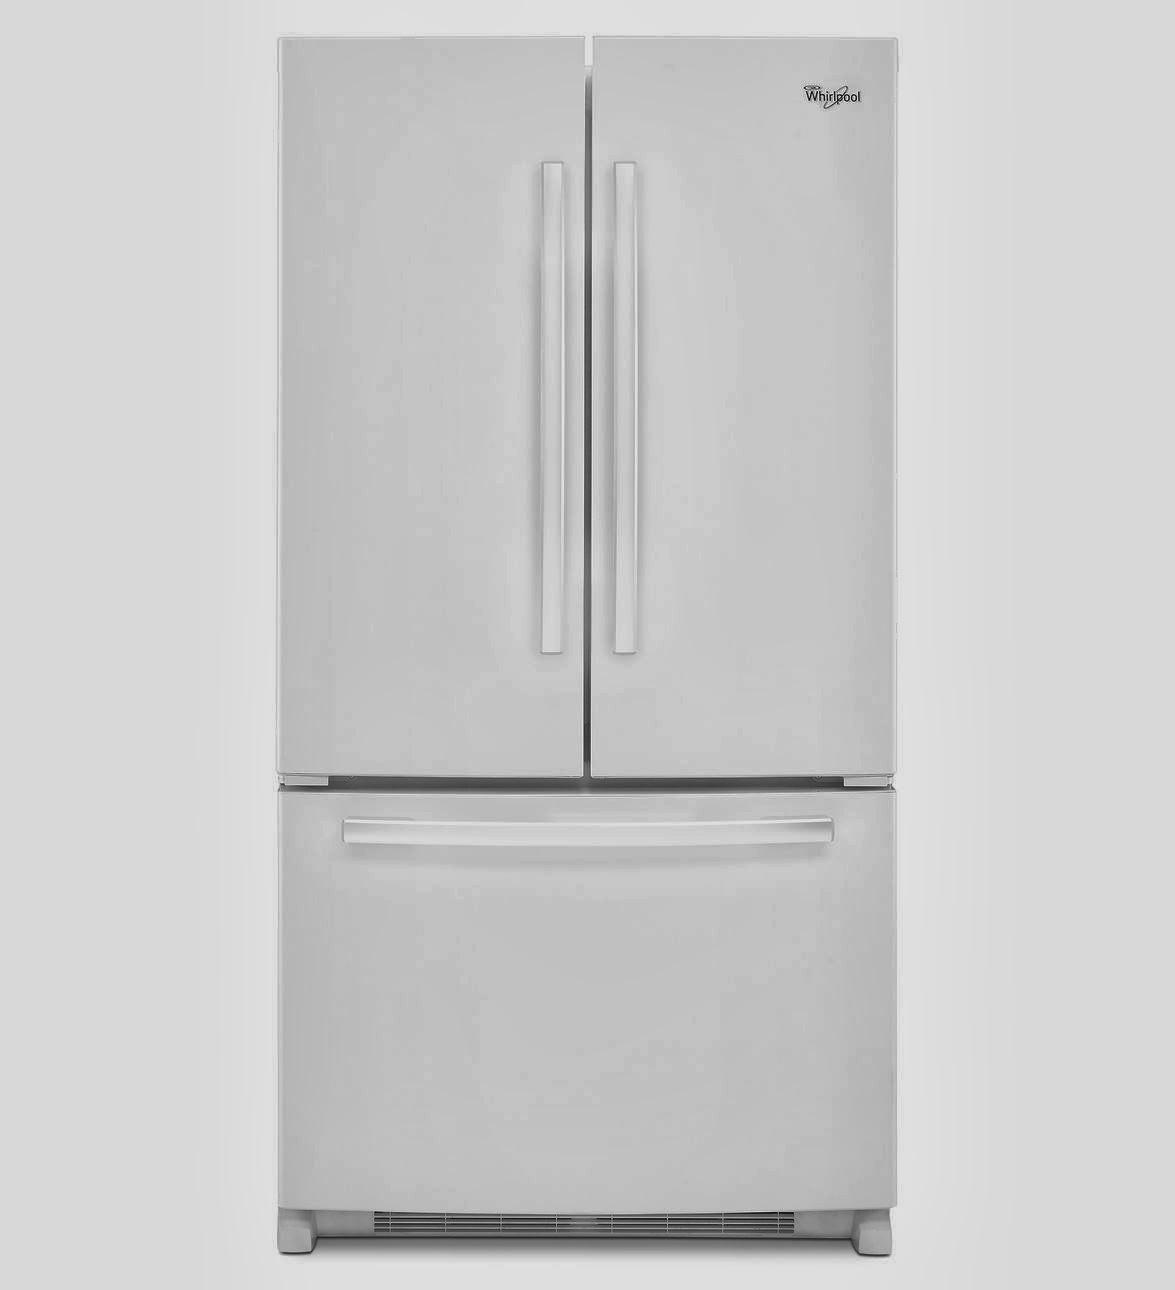 Whirlpool Refrigerator Brand Whirlpool Gx5fhtxvq Gold